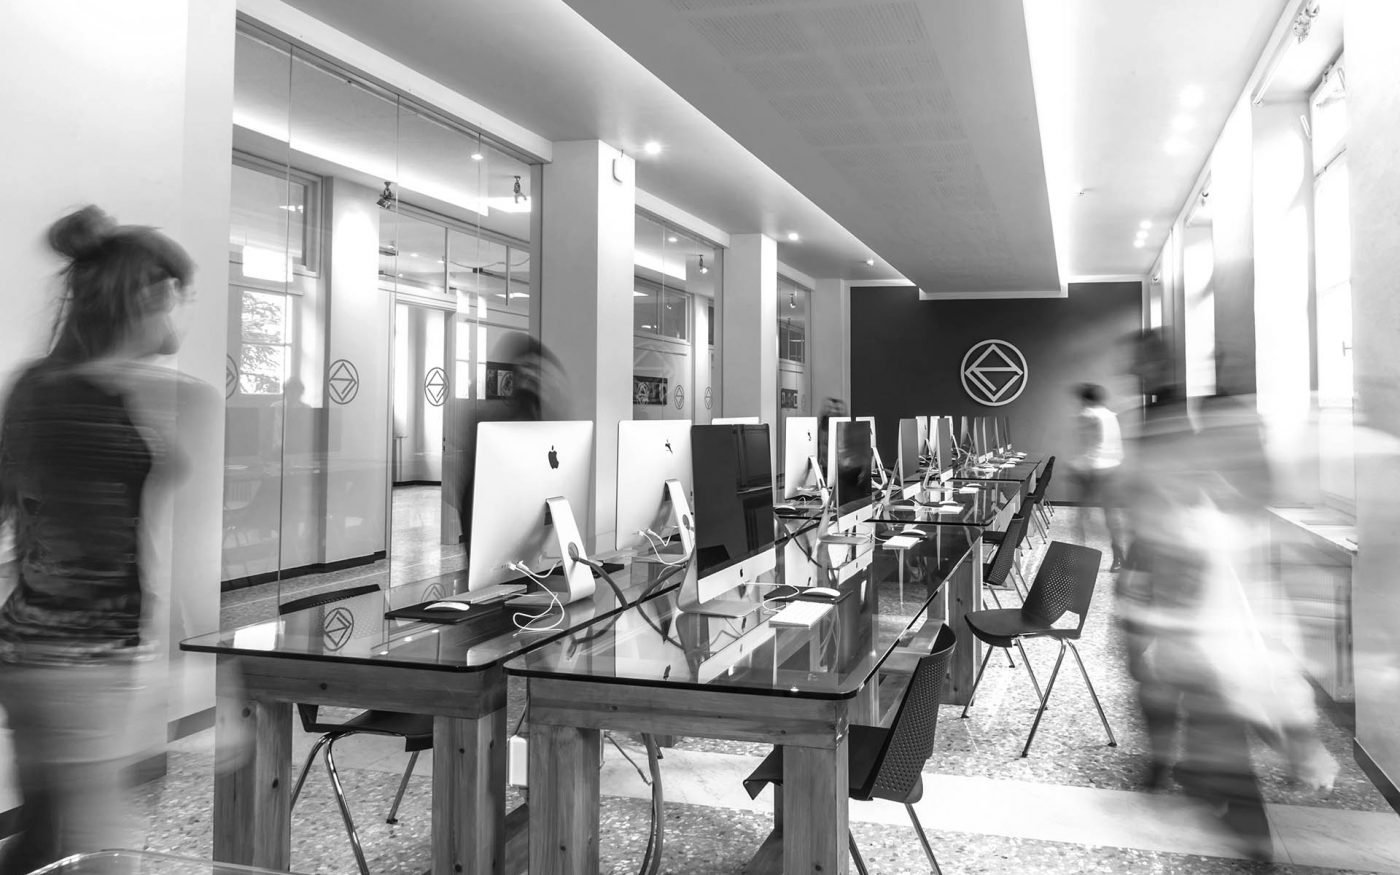 spazi_aula_digitale